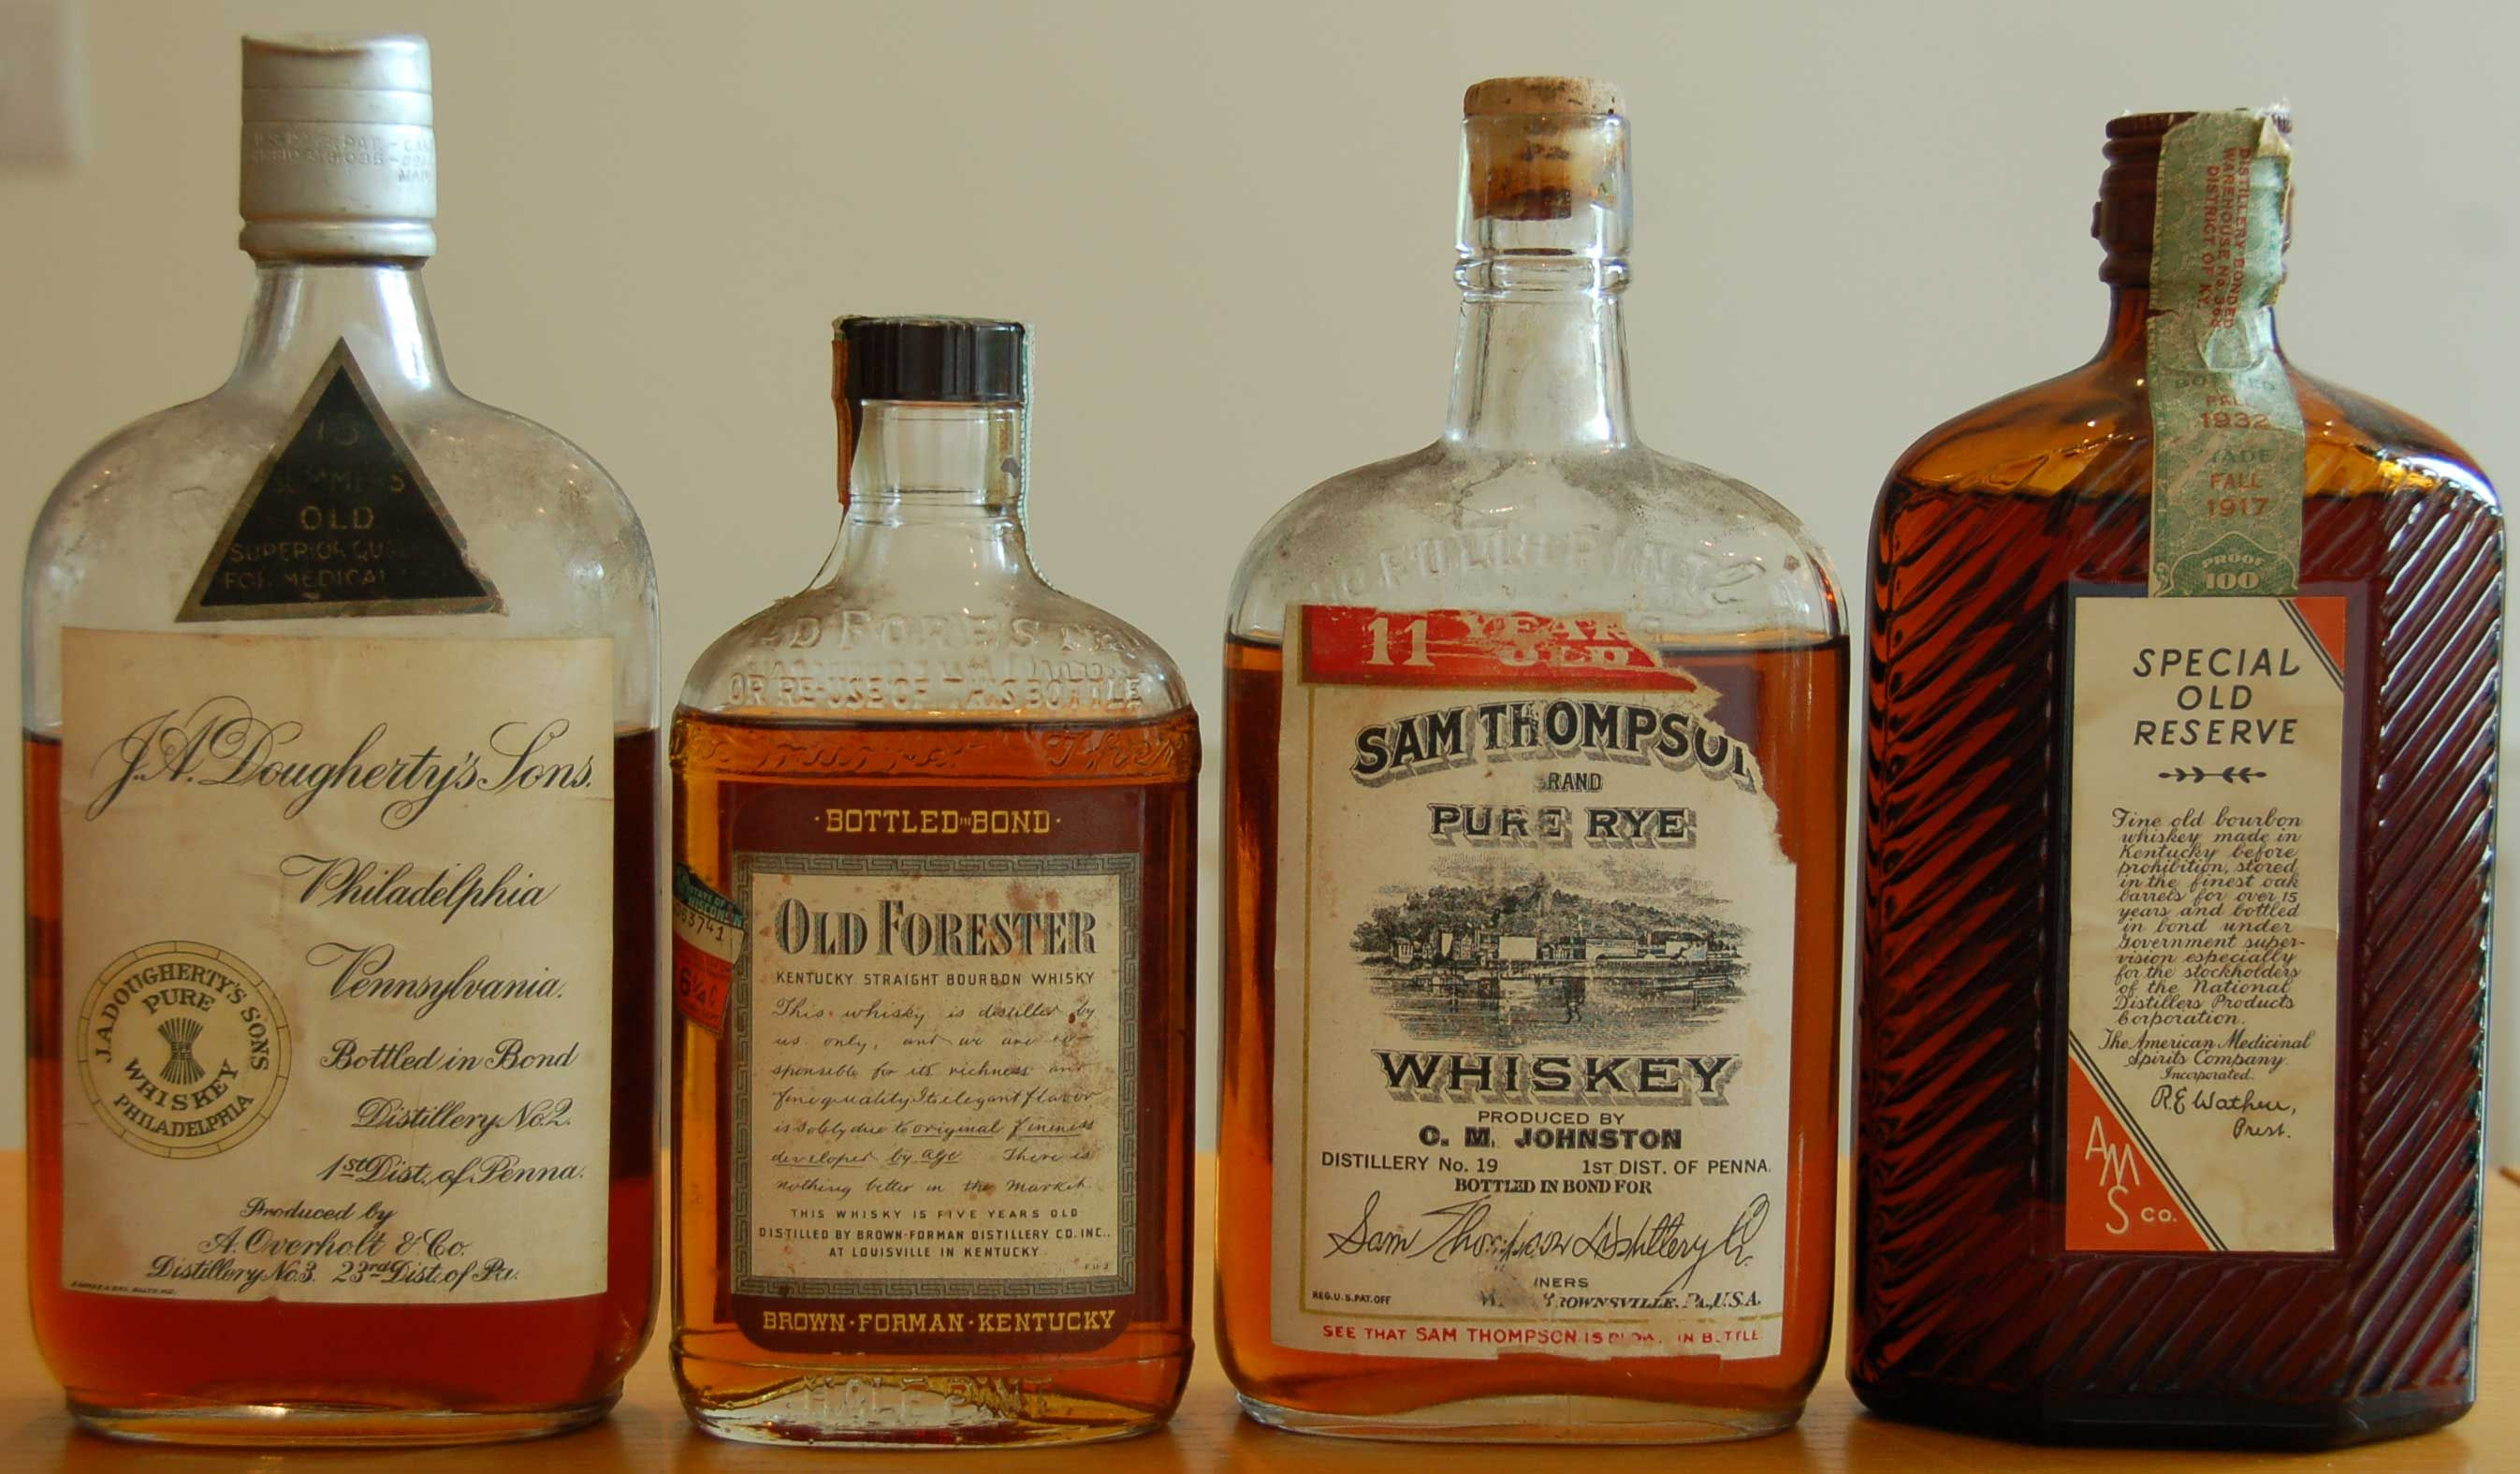 Old Overholt Rye Whiskey Early Bottled In Bond Ad